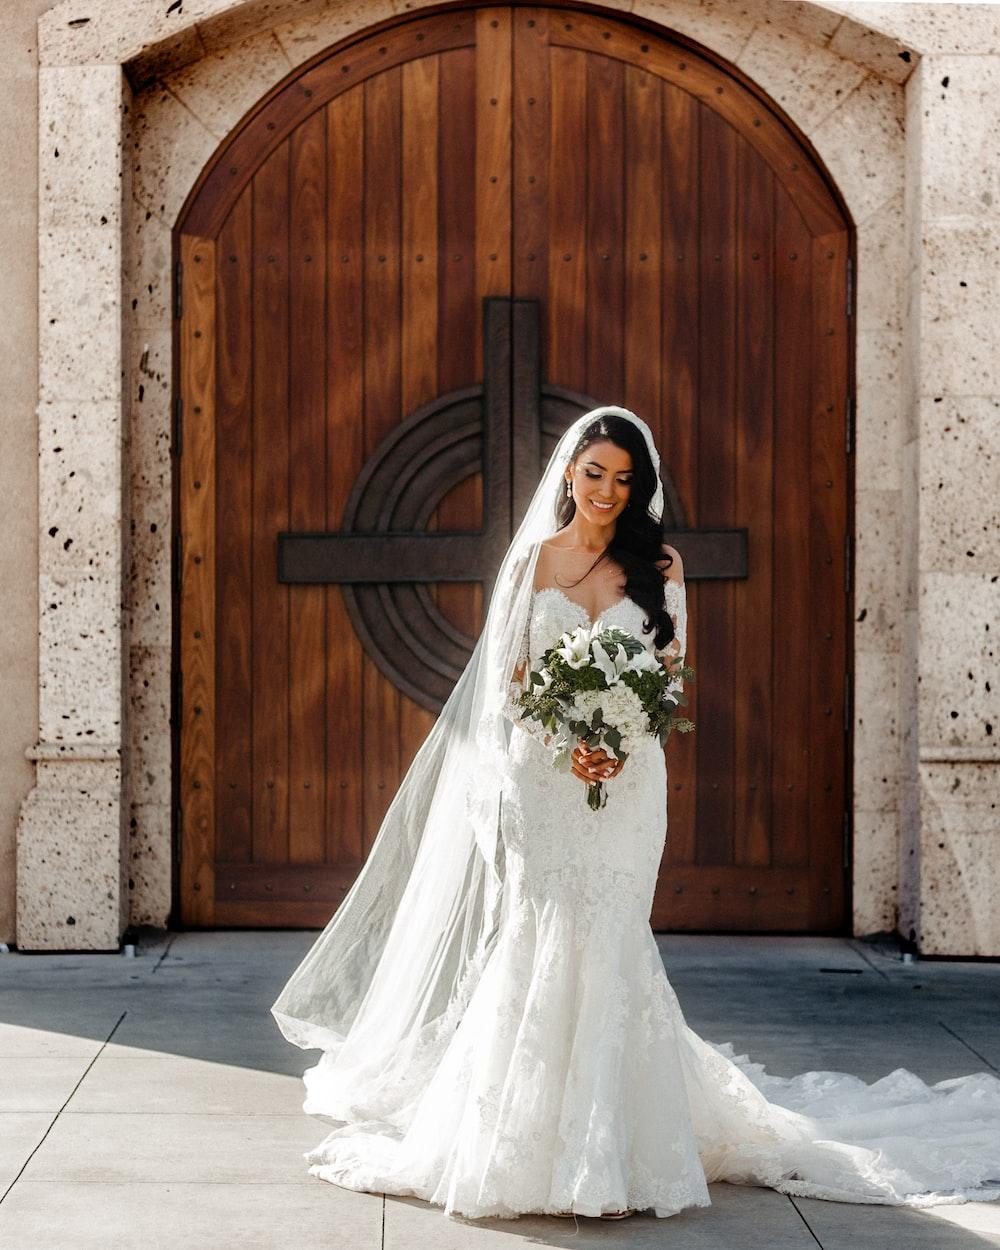 woman wearing wedding dress holding bouquet of flowers